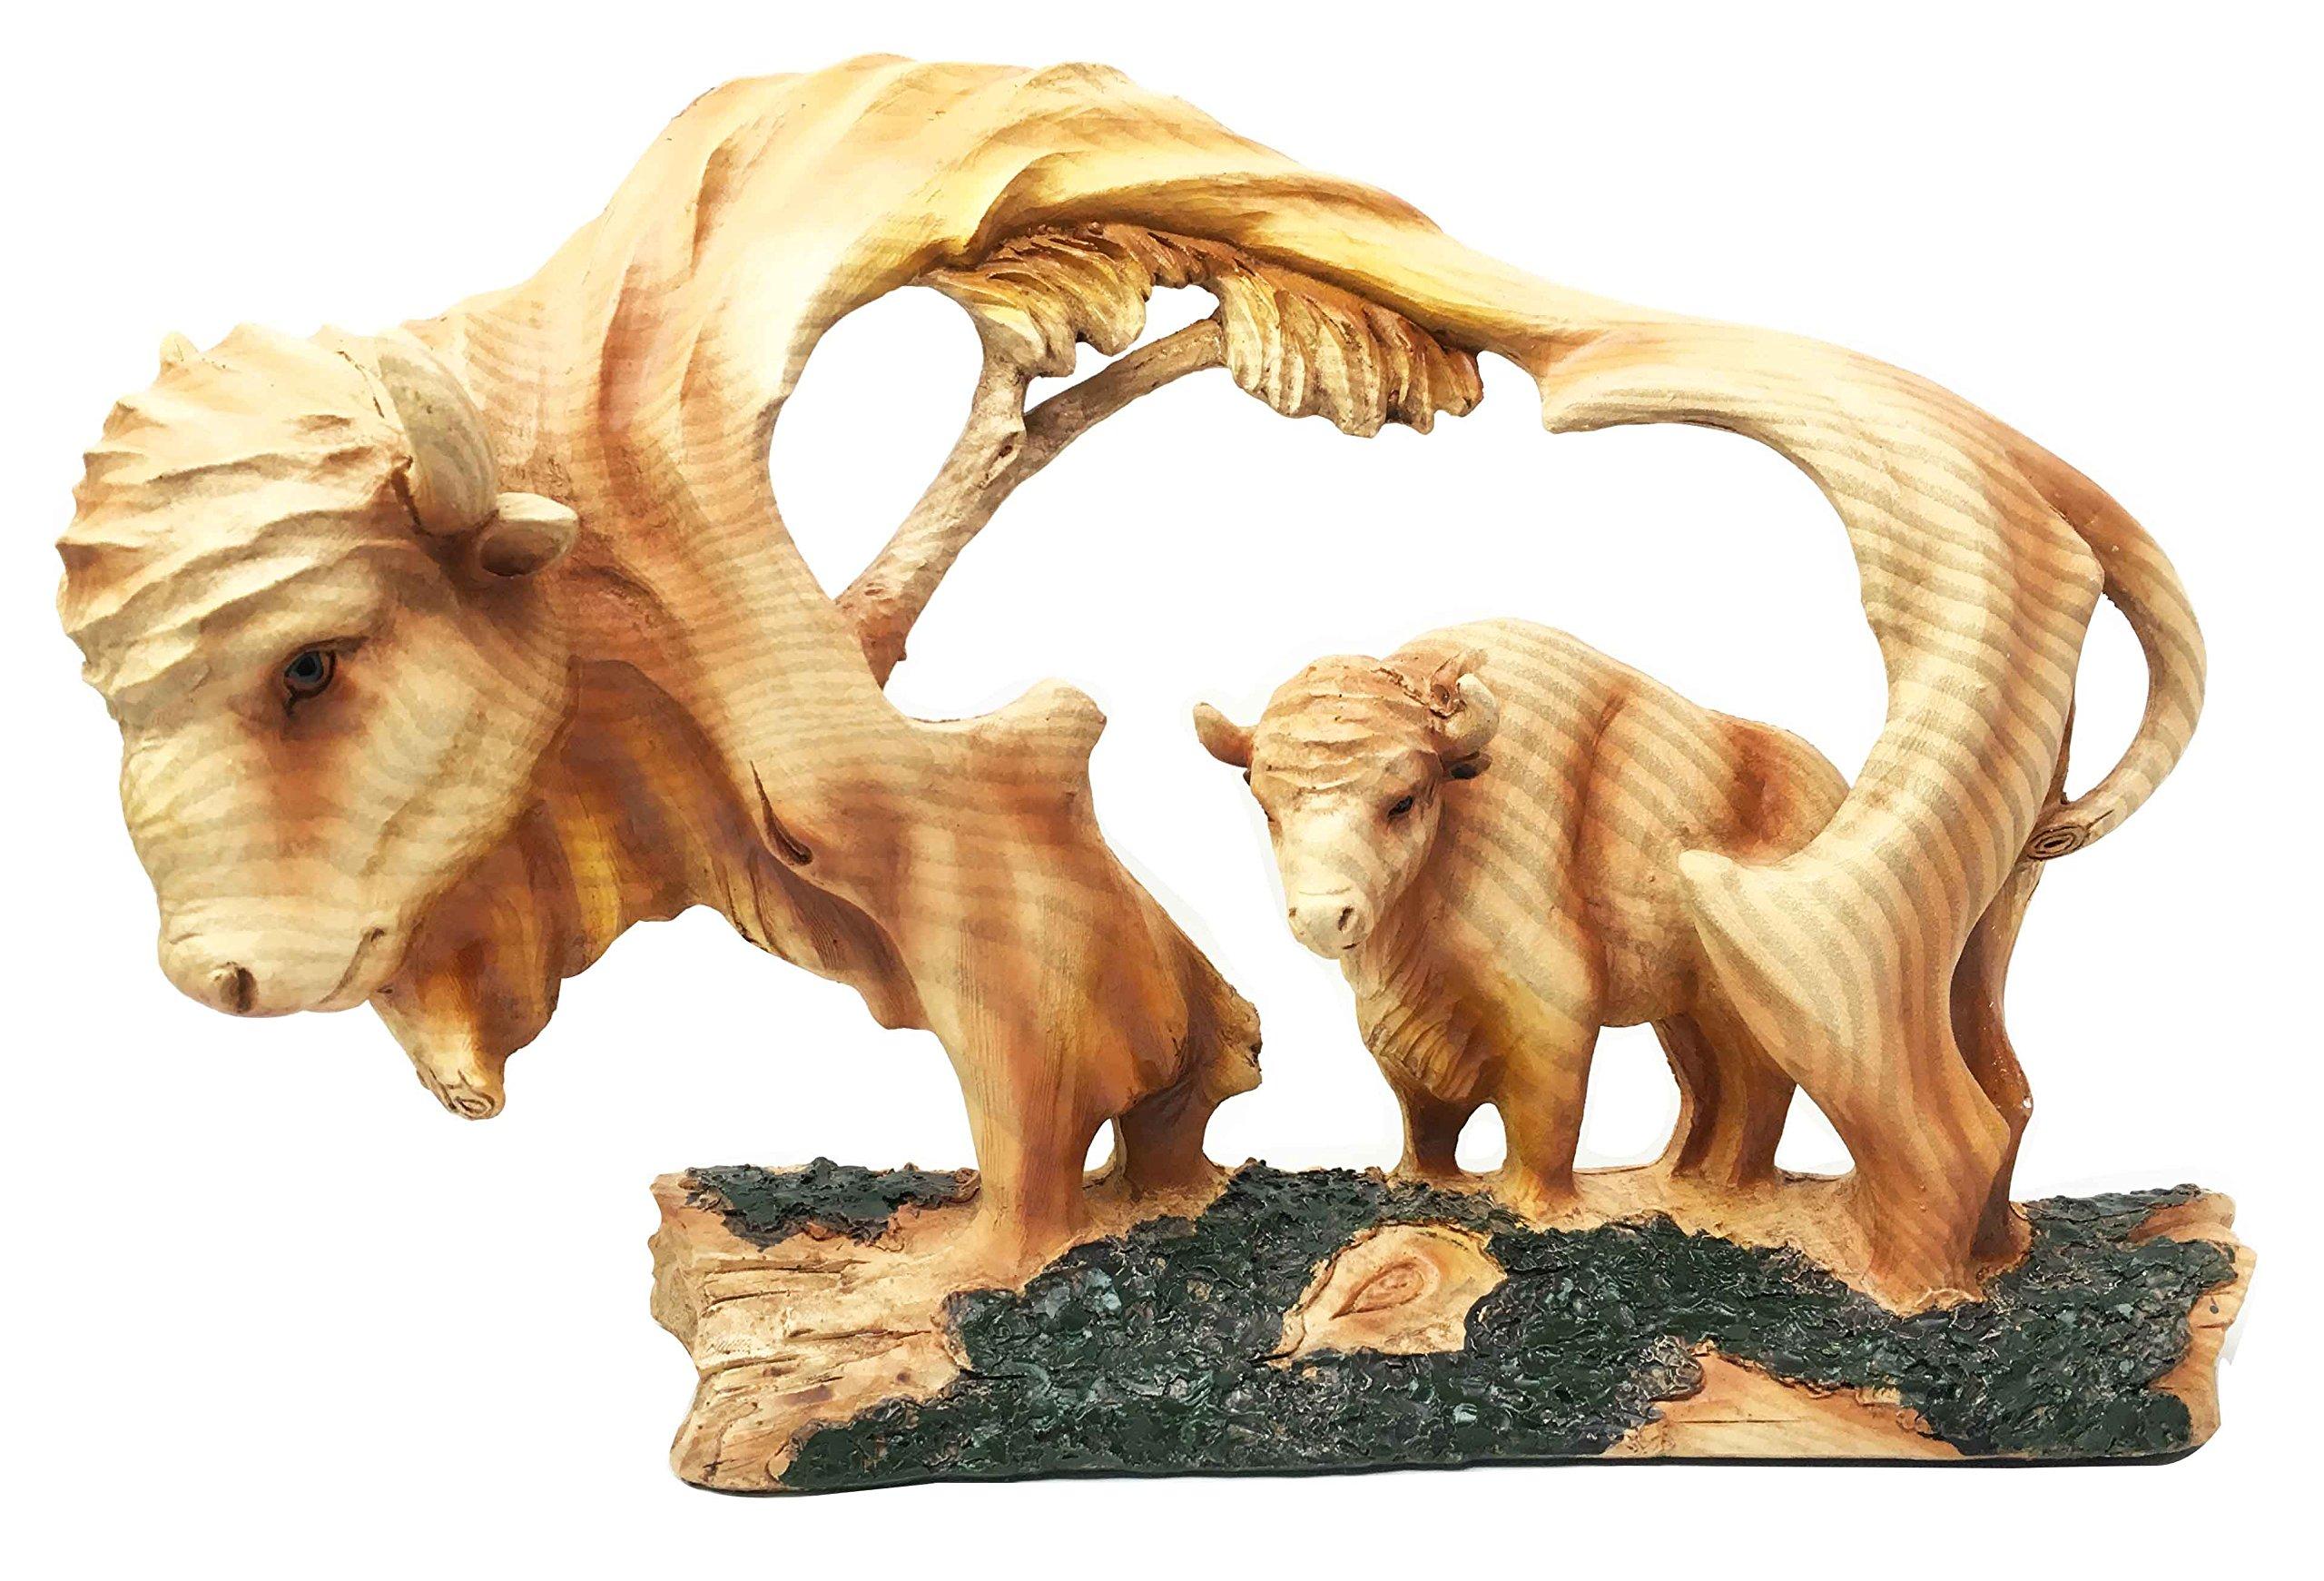 Rustic Grassland American Bison Buffalo Wildlife Scene Figurine Faux Wood Statue